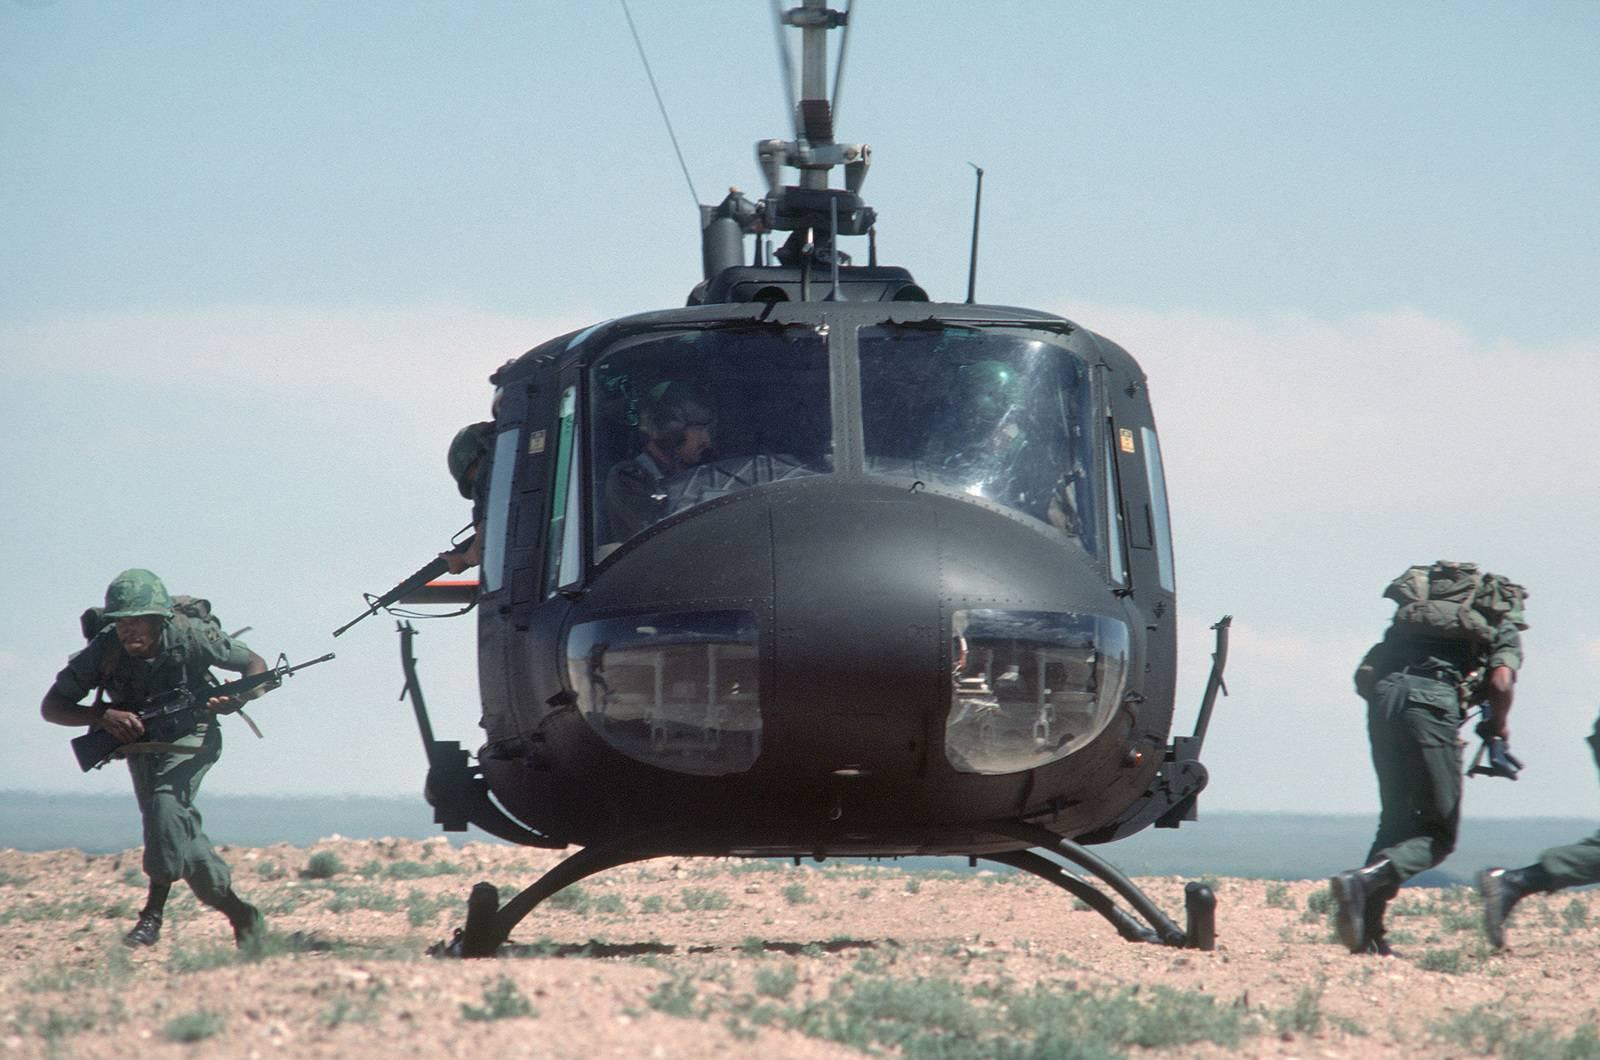 Sikorsky h-34